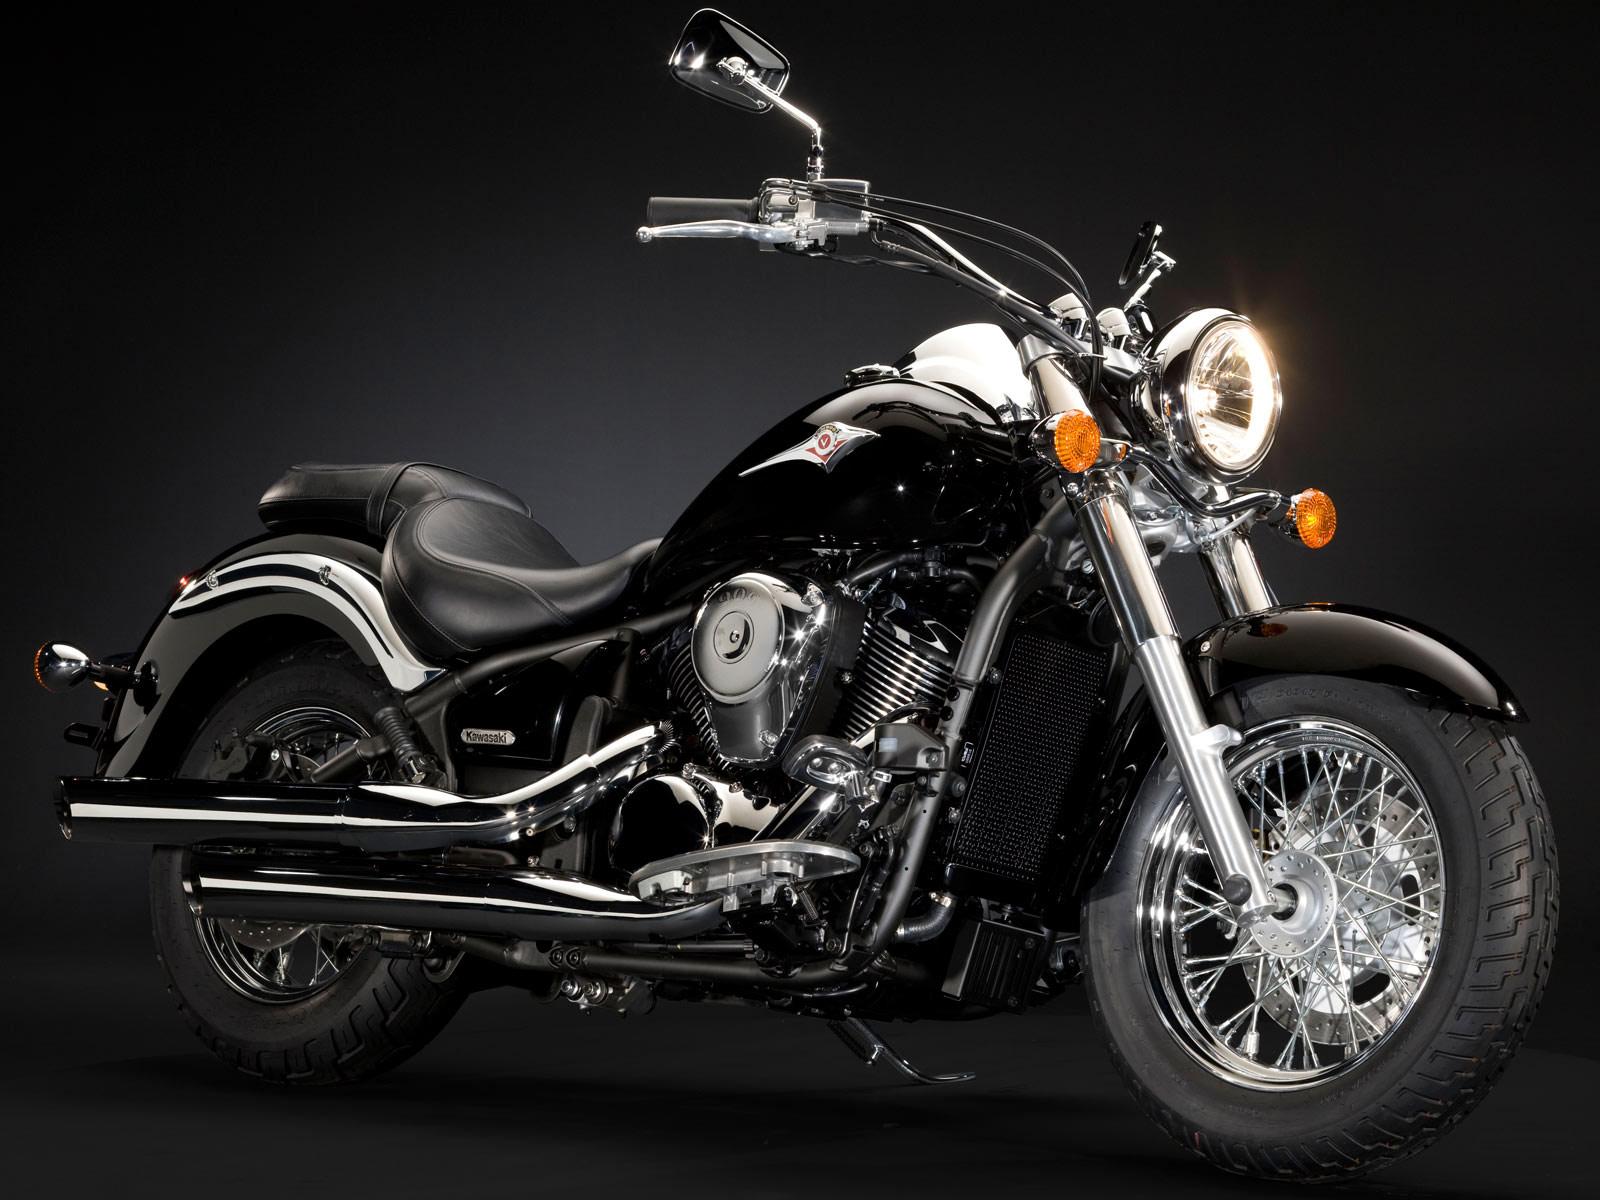 Najlepsi Motorcikli 2009_kawazaki_vn900_classic_motorcycle-desktop-wallpaper_1